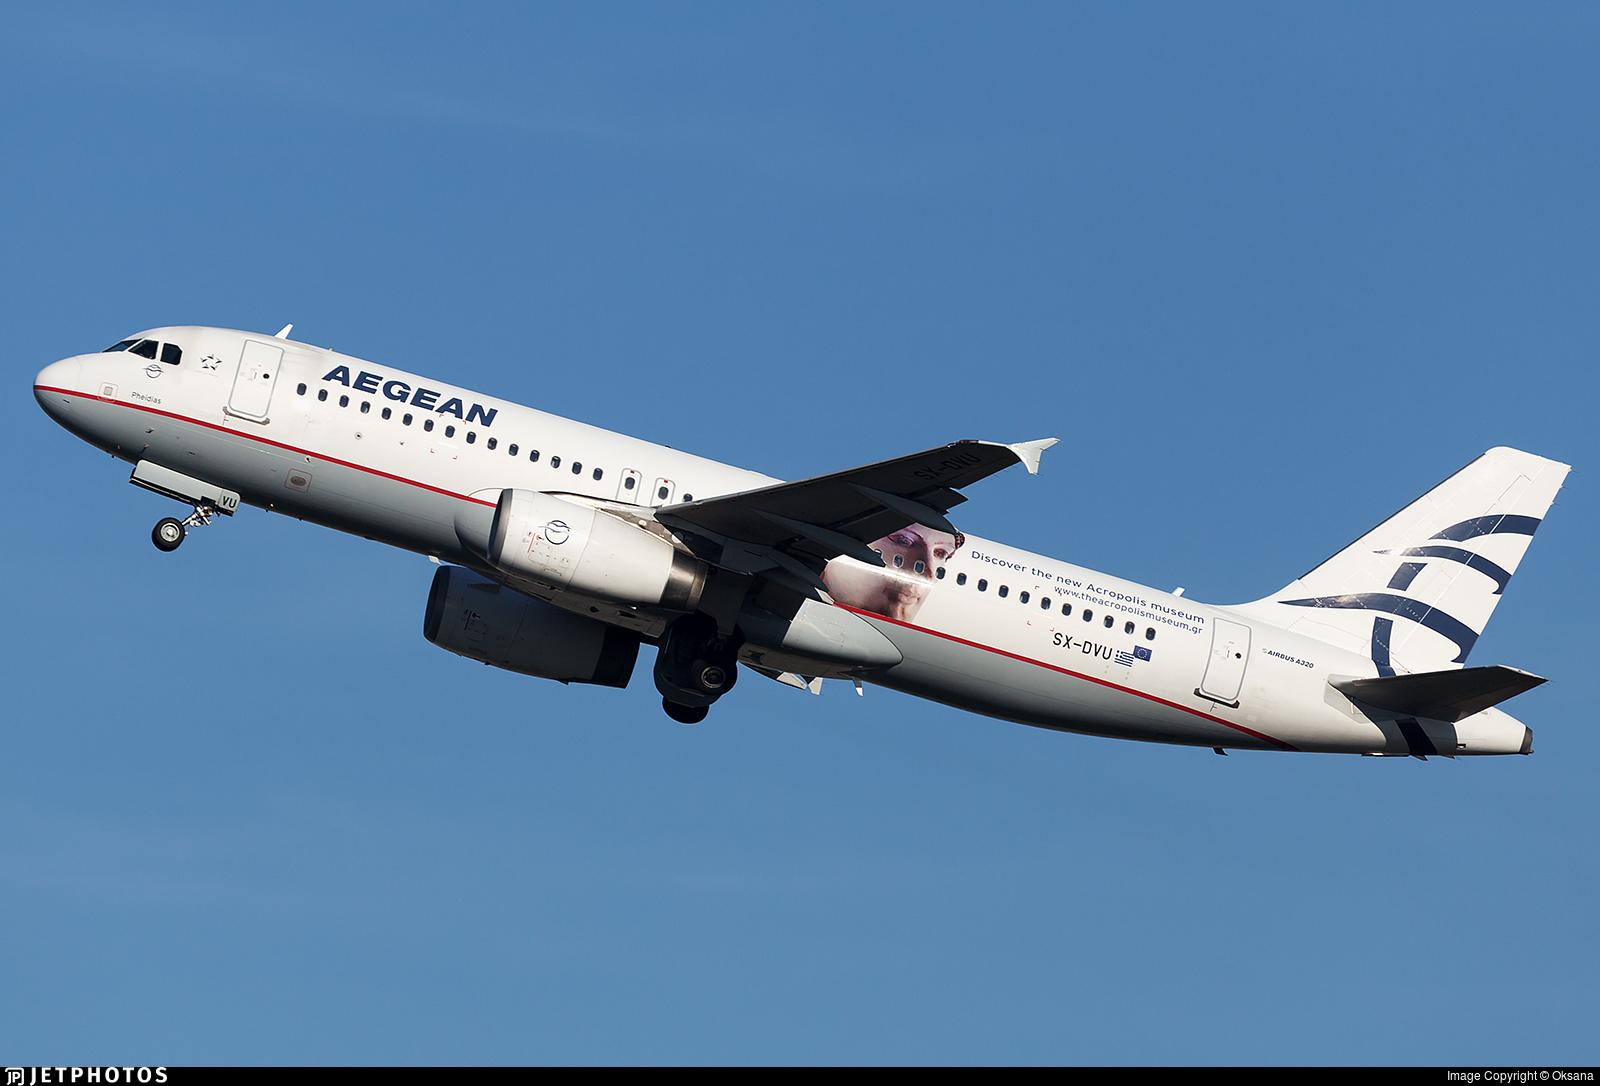 SX-DVU - Airbus A320-232 - Aegean Airlines